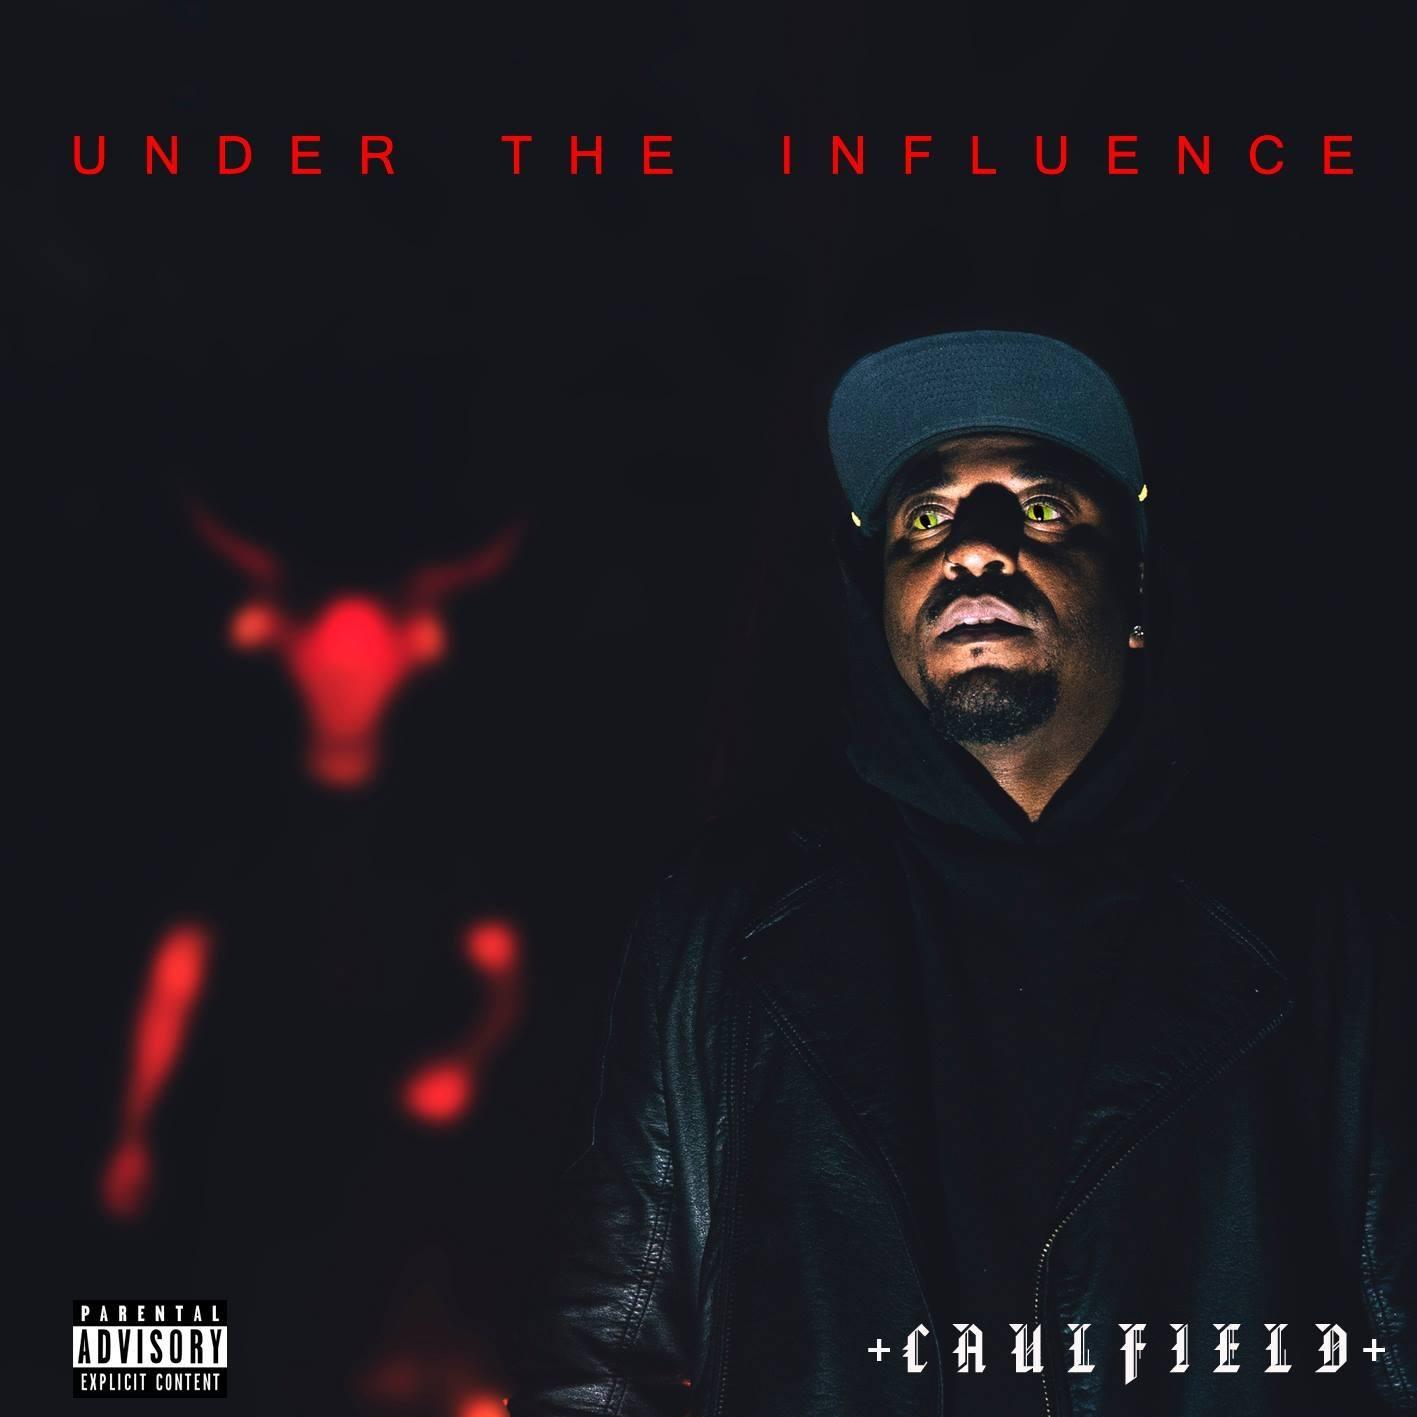 Under the Influence - Caulfield